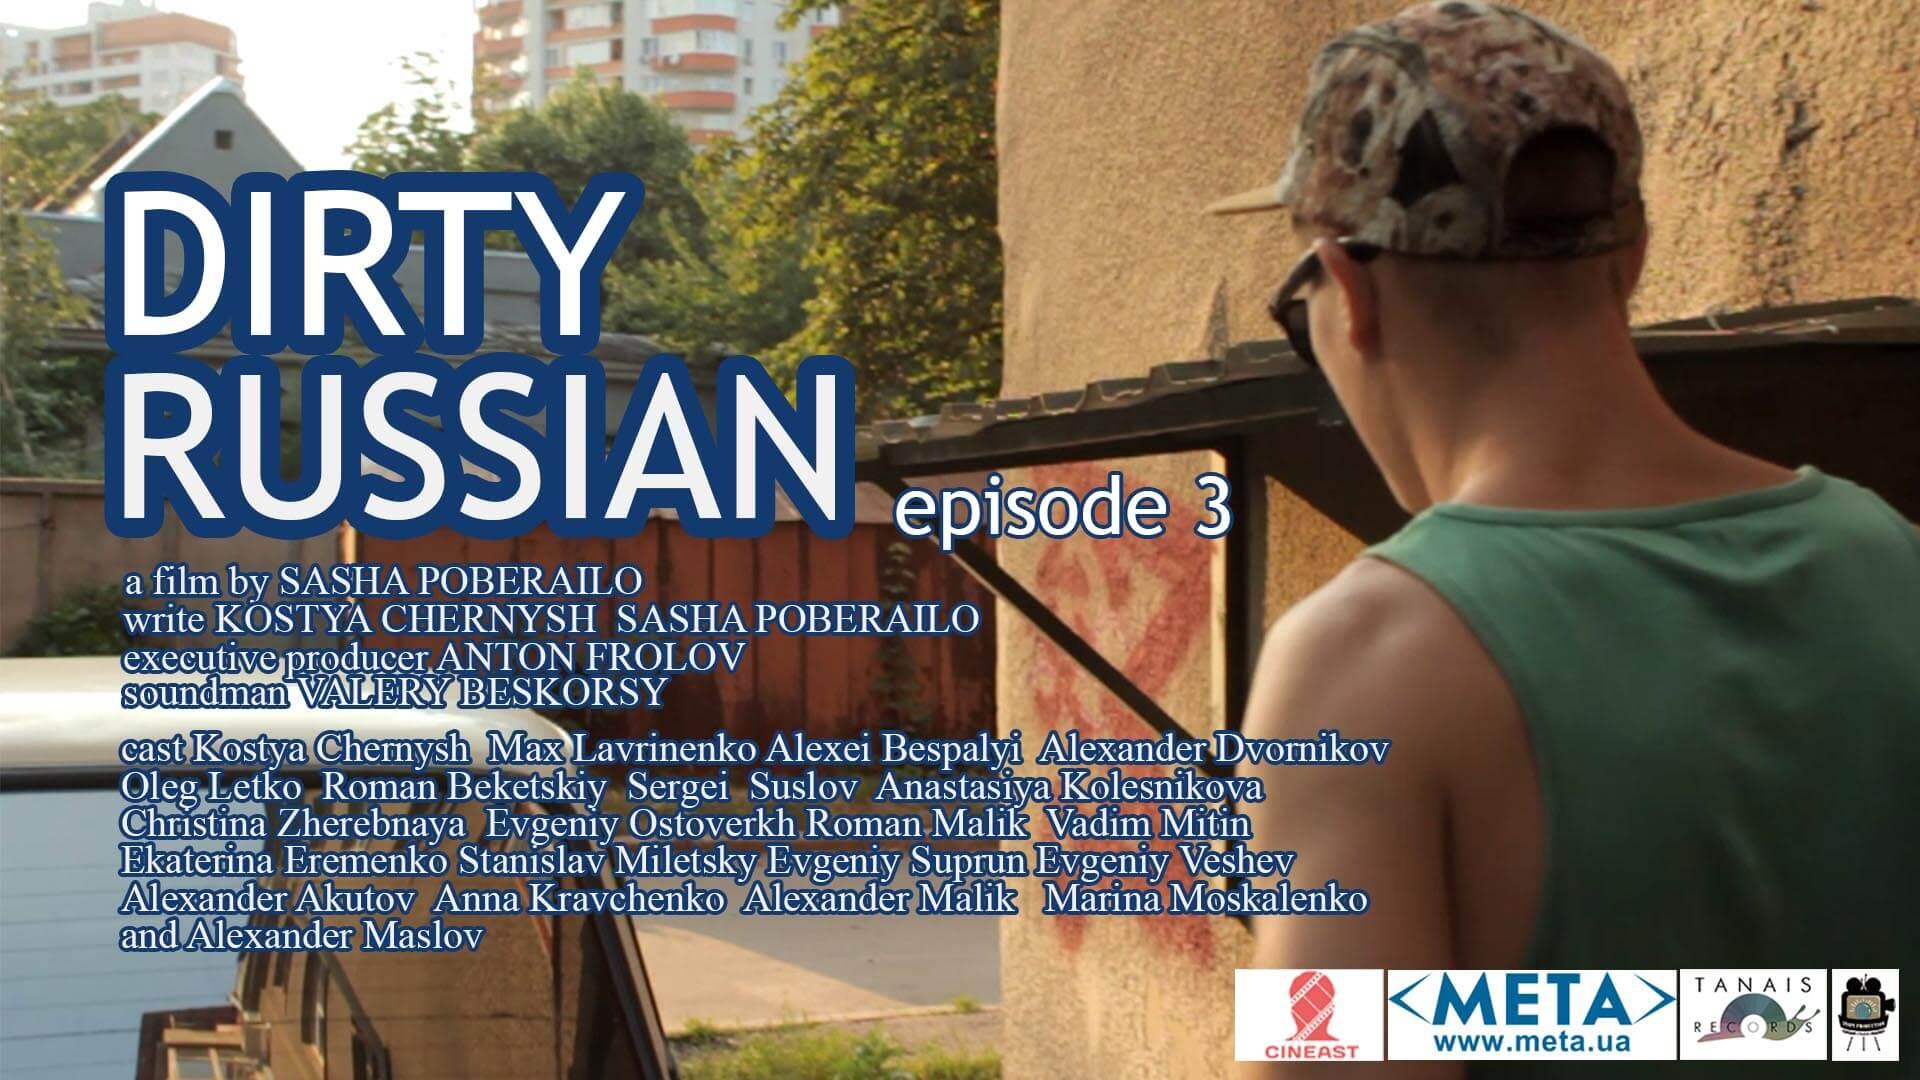 dirty russian episode 3 - украинское кино